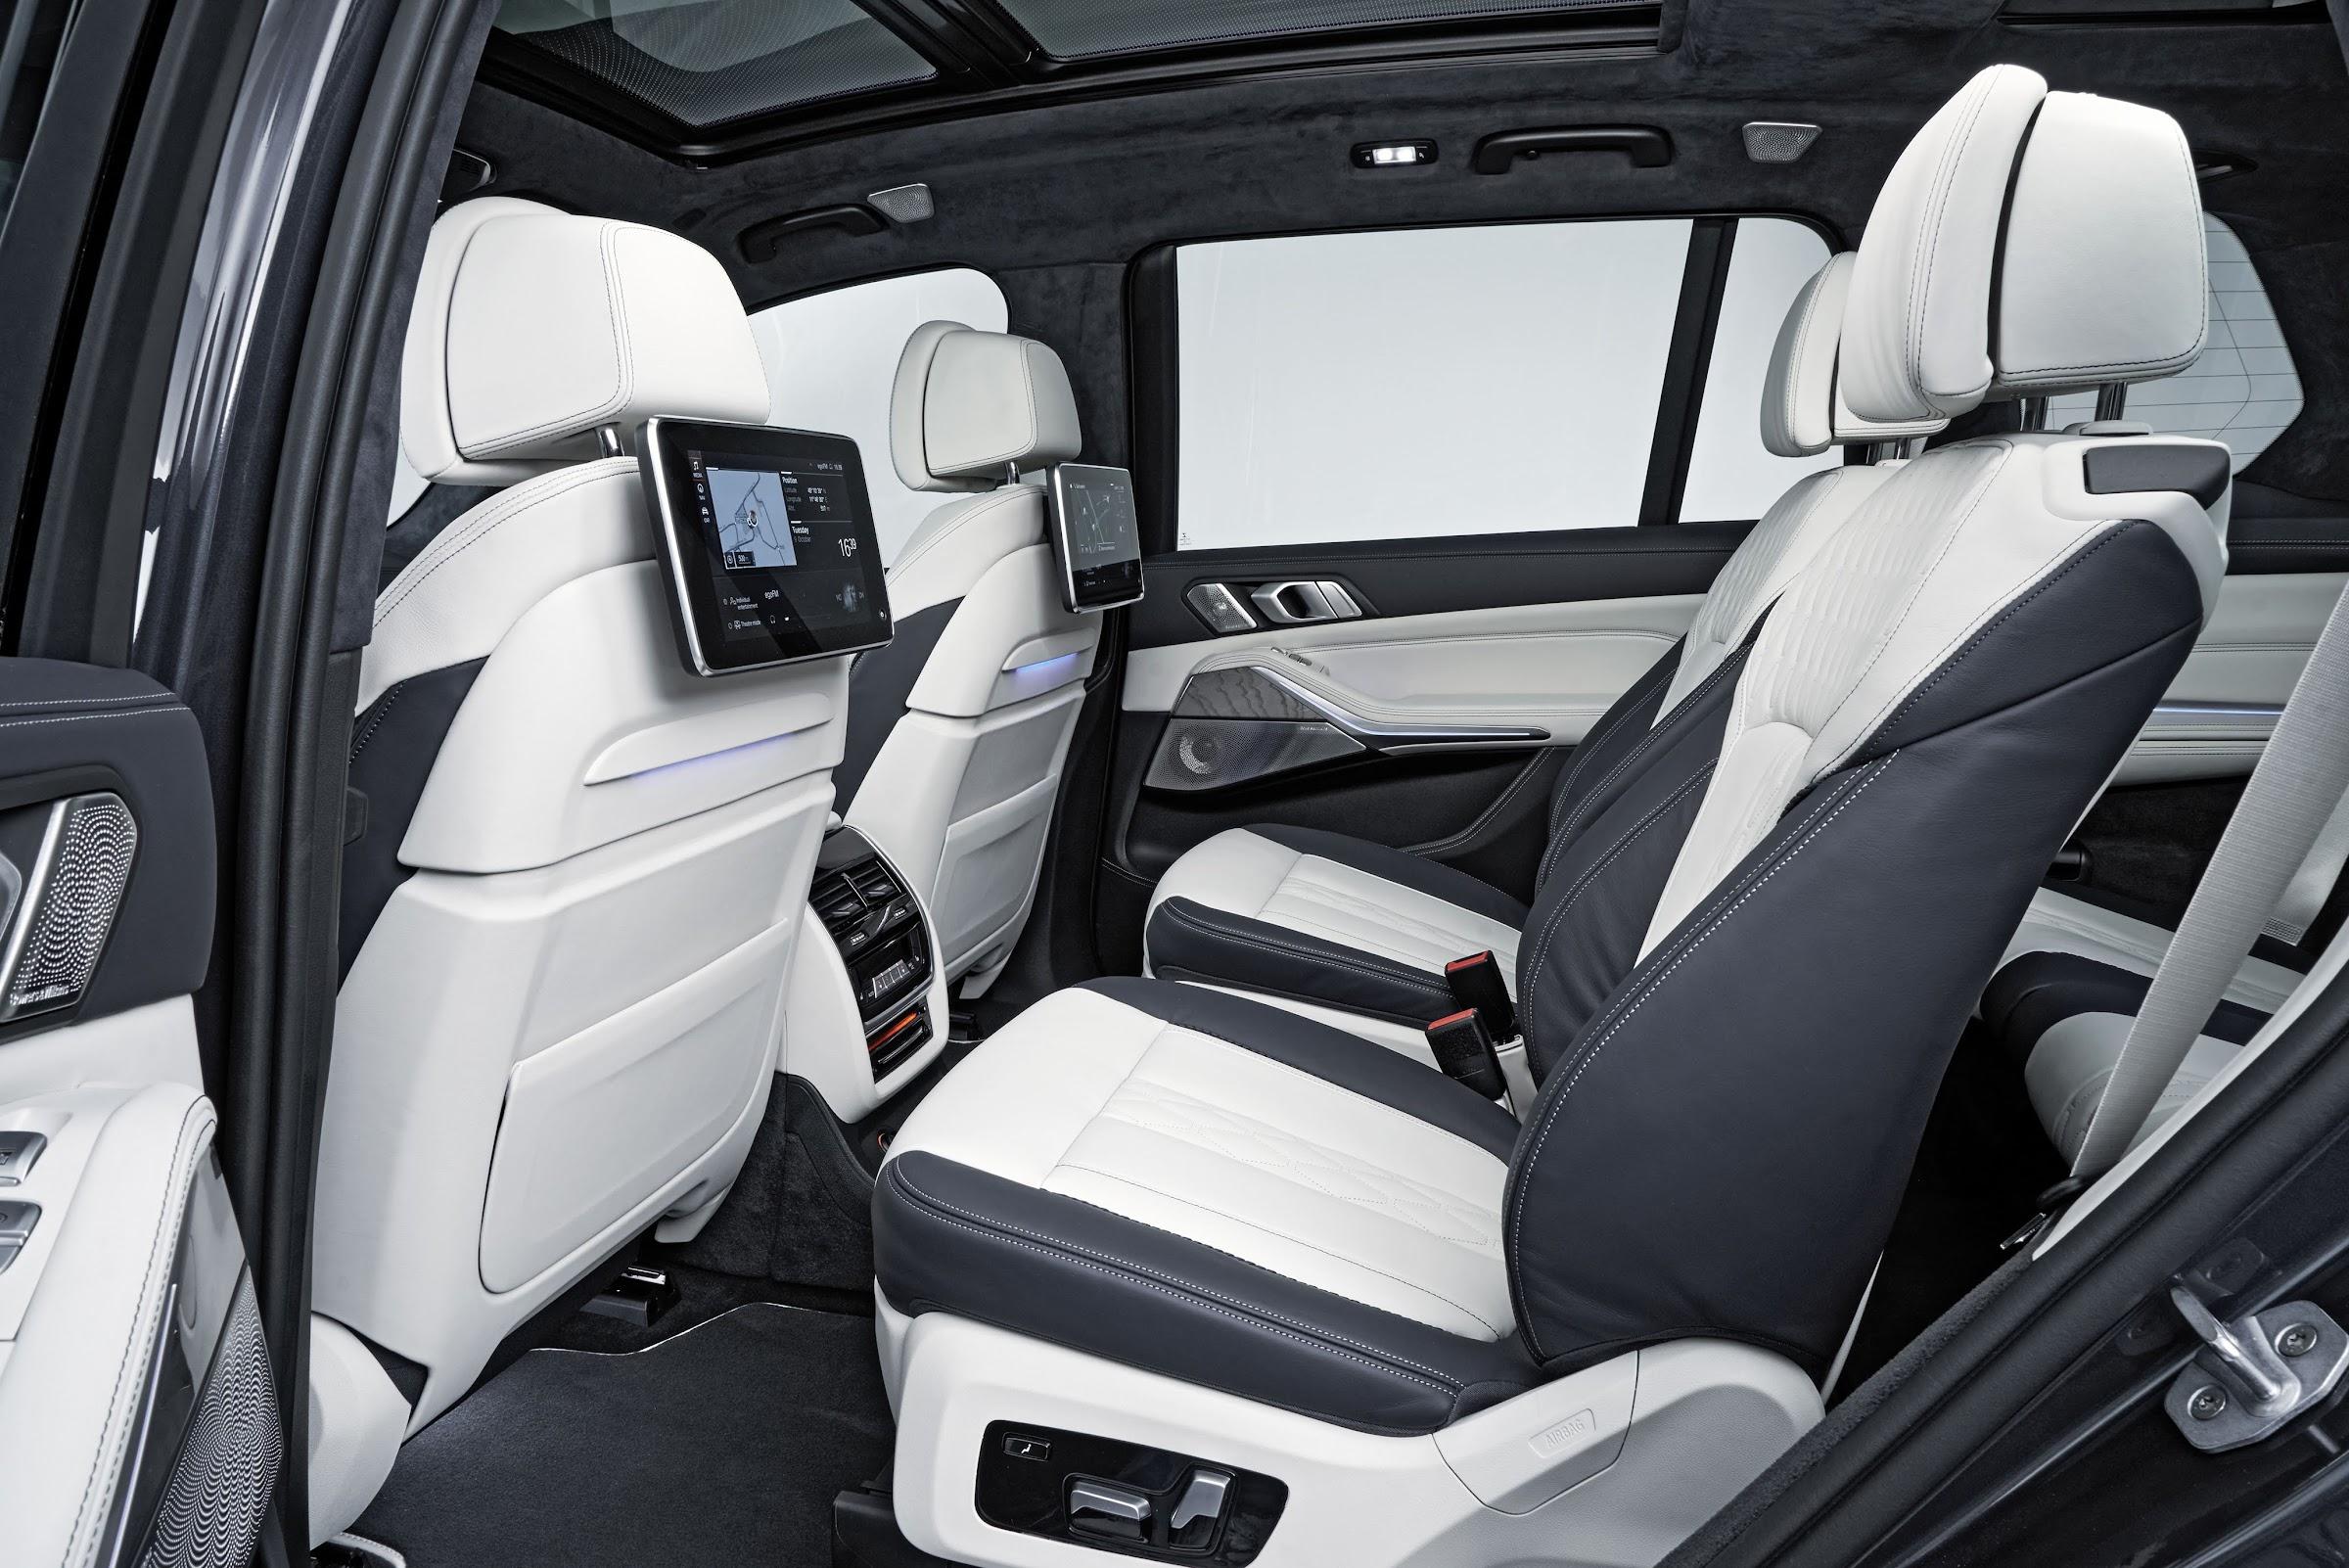 9WKDXdLeTXXl1sHINcLYue86BuWXWsF pbTyCuaJWhn7prSEQqyDRxMLz6QHmNgVPLpHR4BJcnuBFazF0mpblnfiANgKidsA3QikONcimUkGZDvUVYcV0FK3BgciLK19lyOTmDi9OA=w2400 - Presentado el nuevo BMW X7